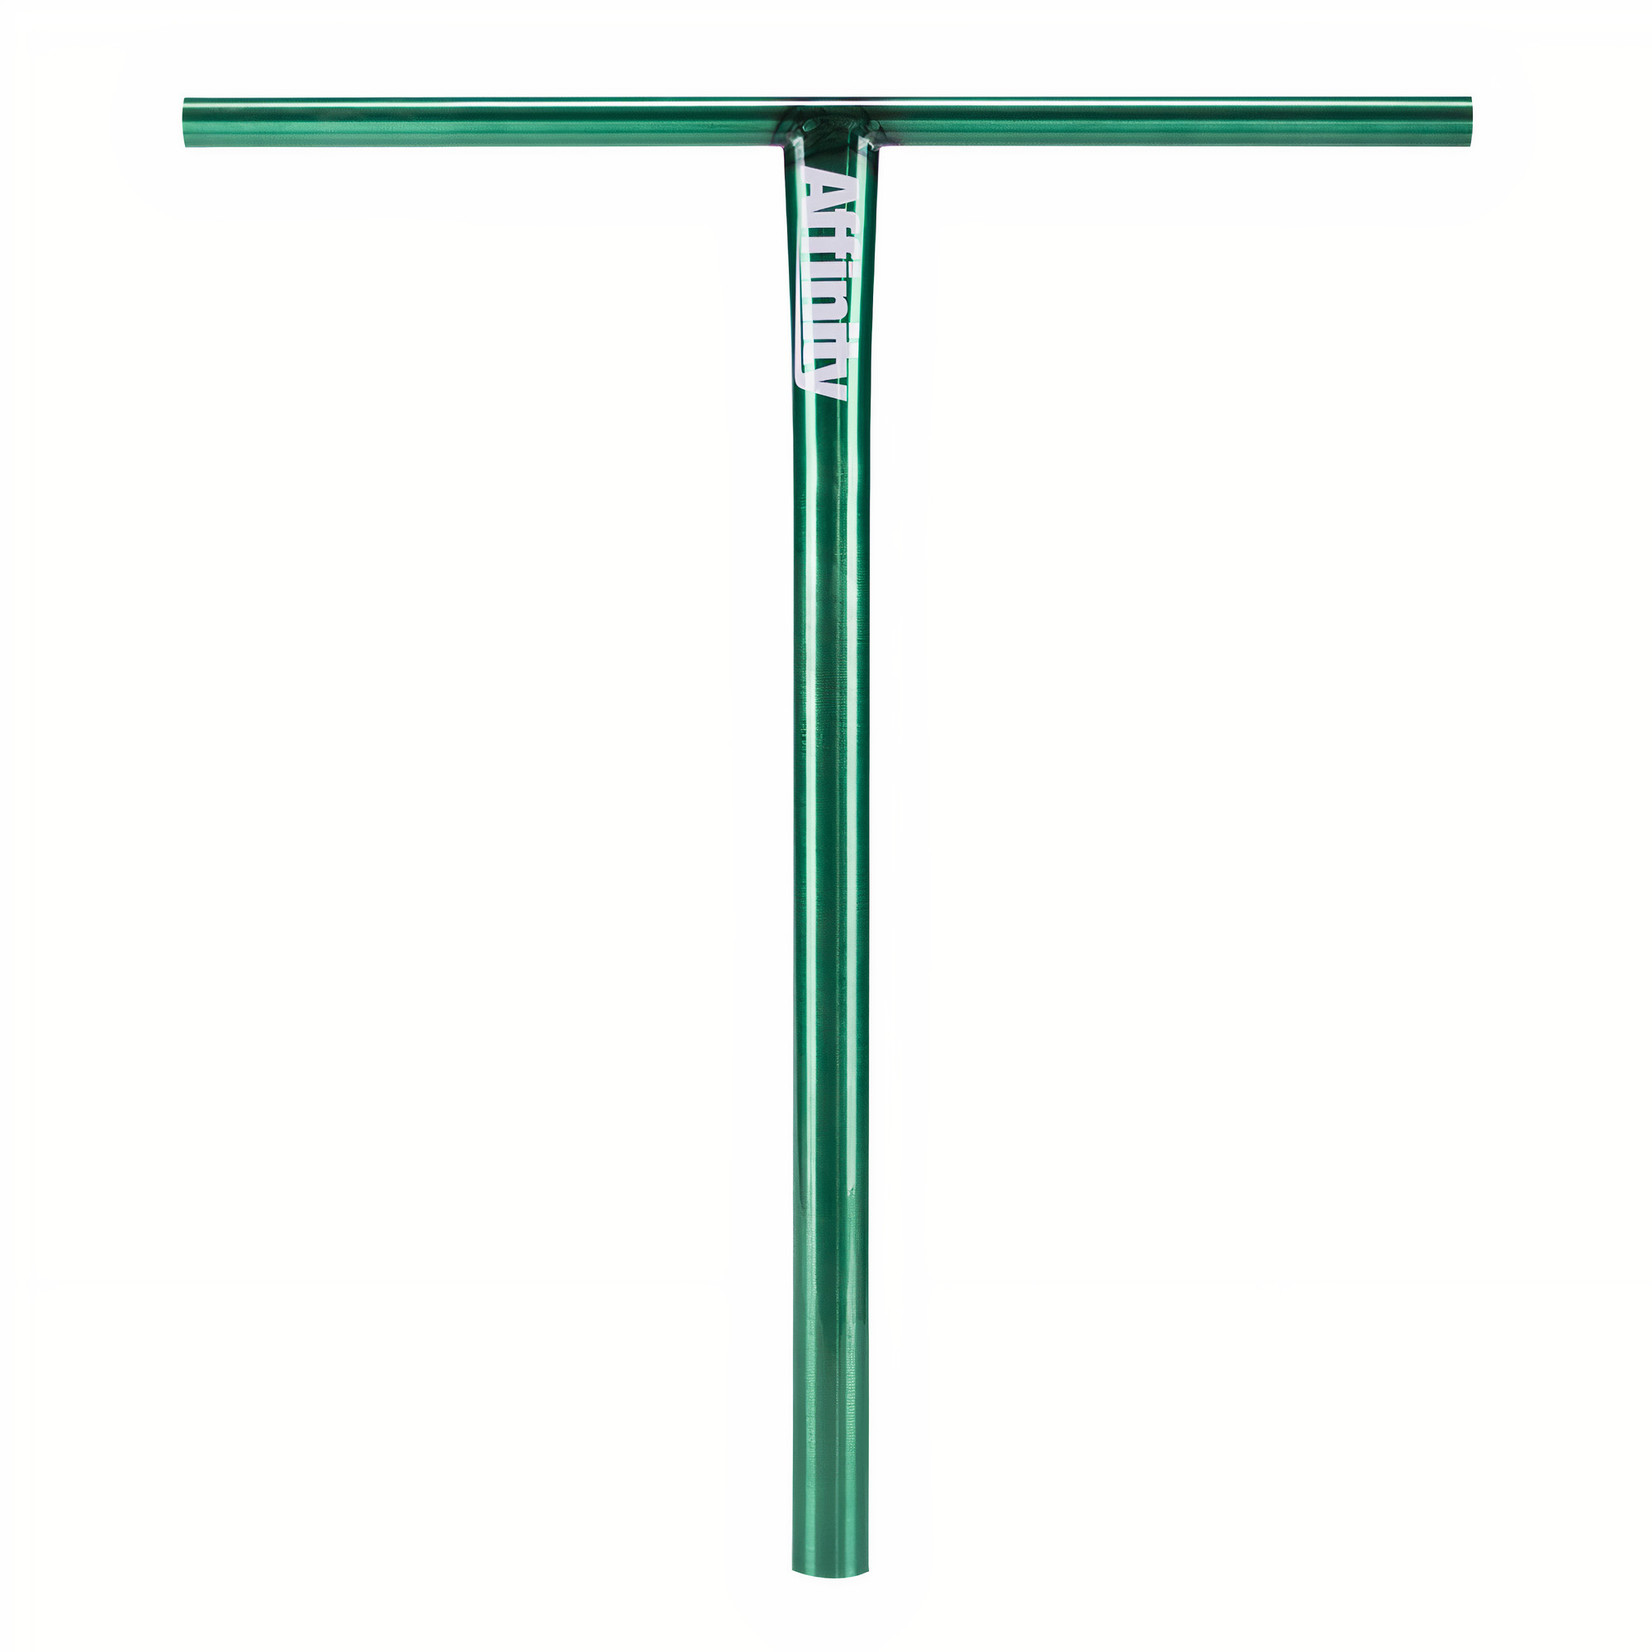 Affinity Affinity - Classic T-Bar - Standard XL - Trans Green